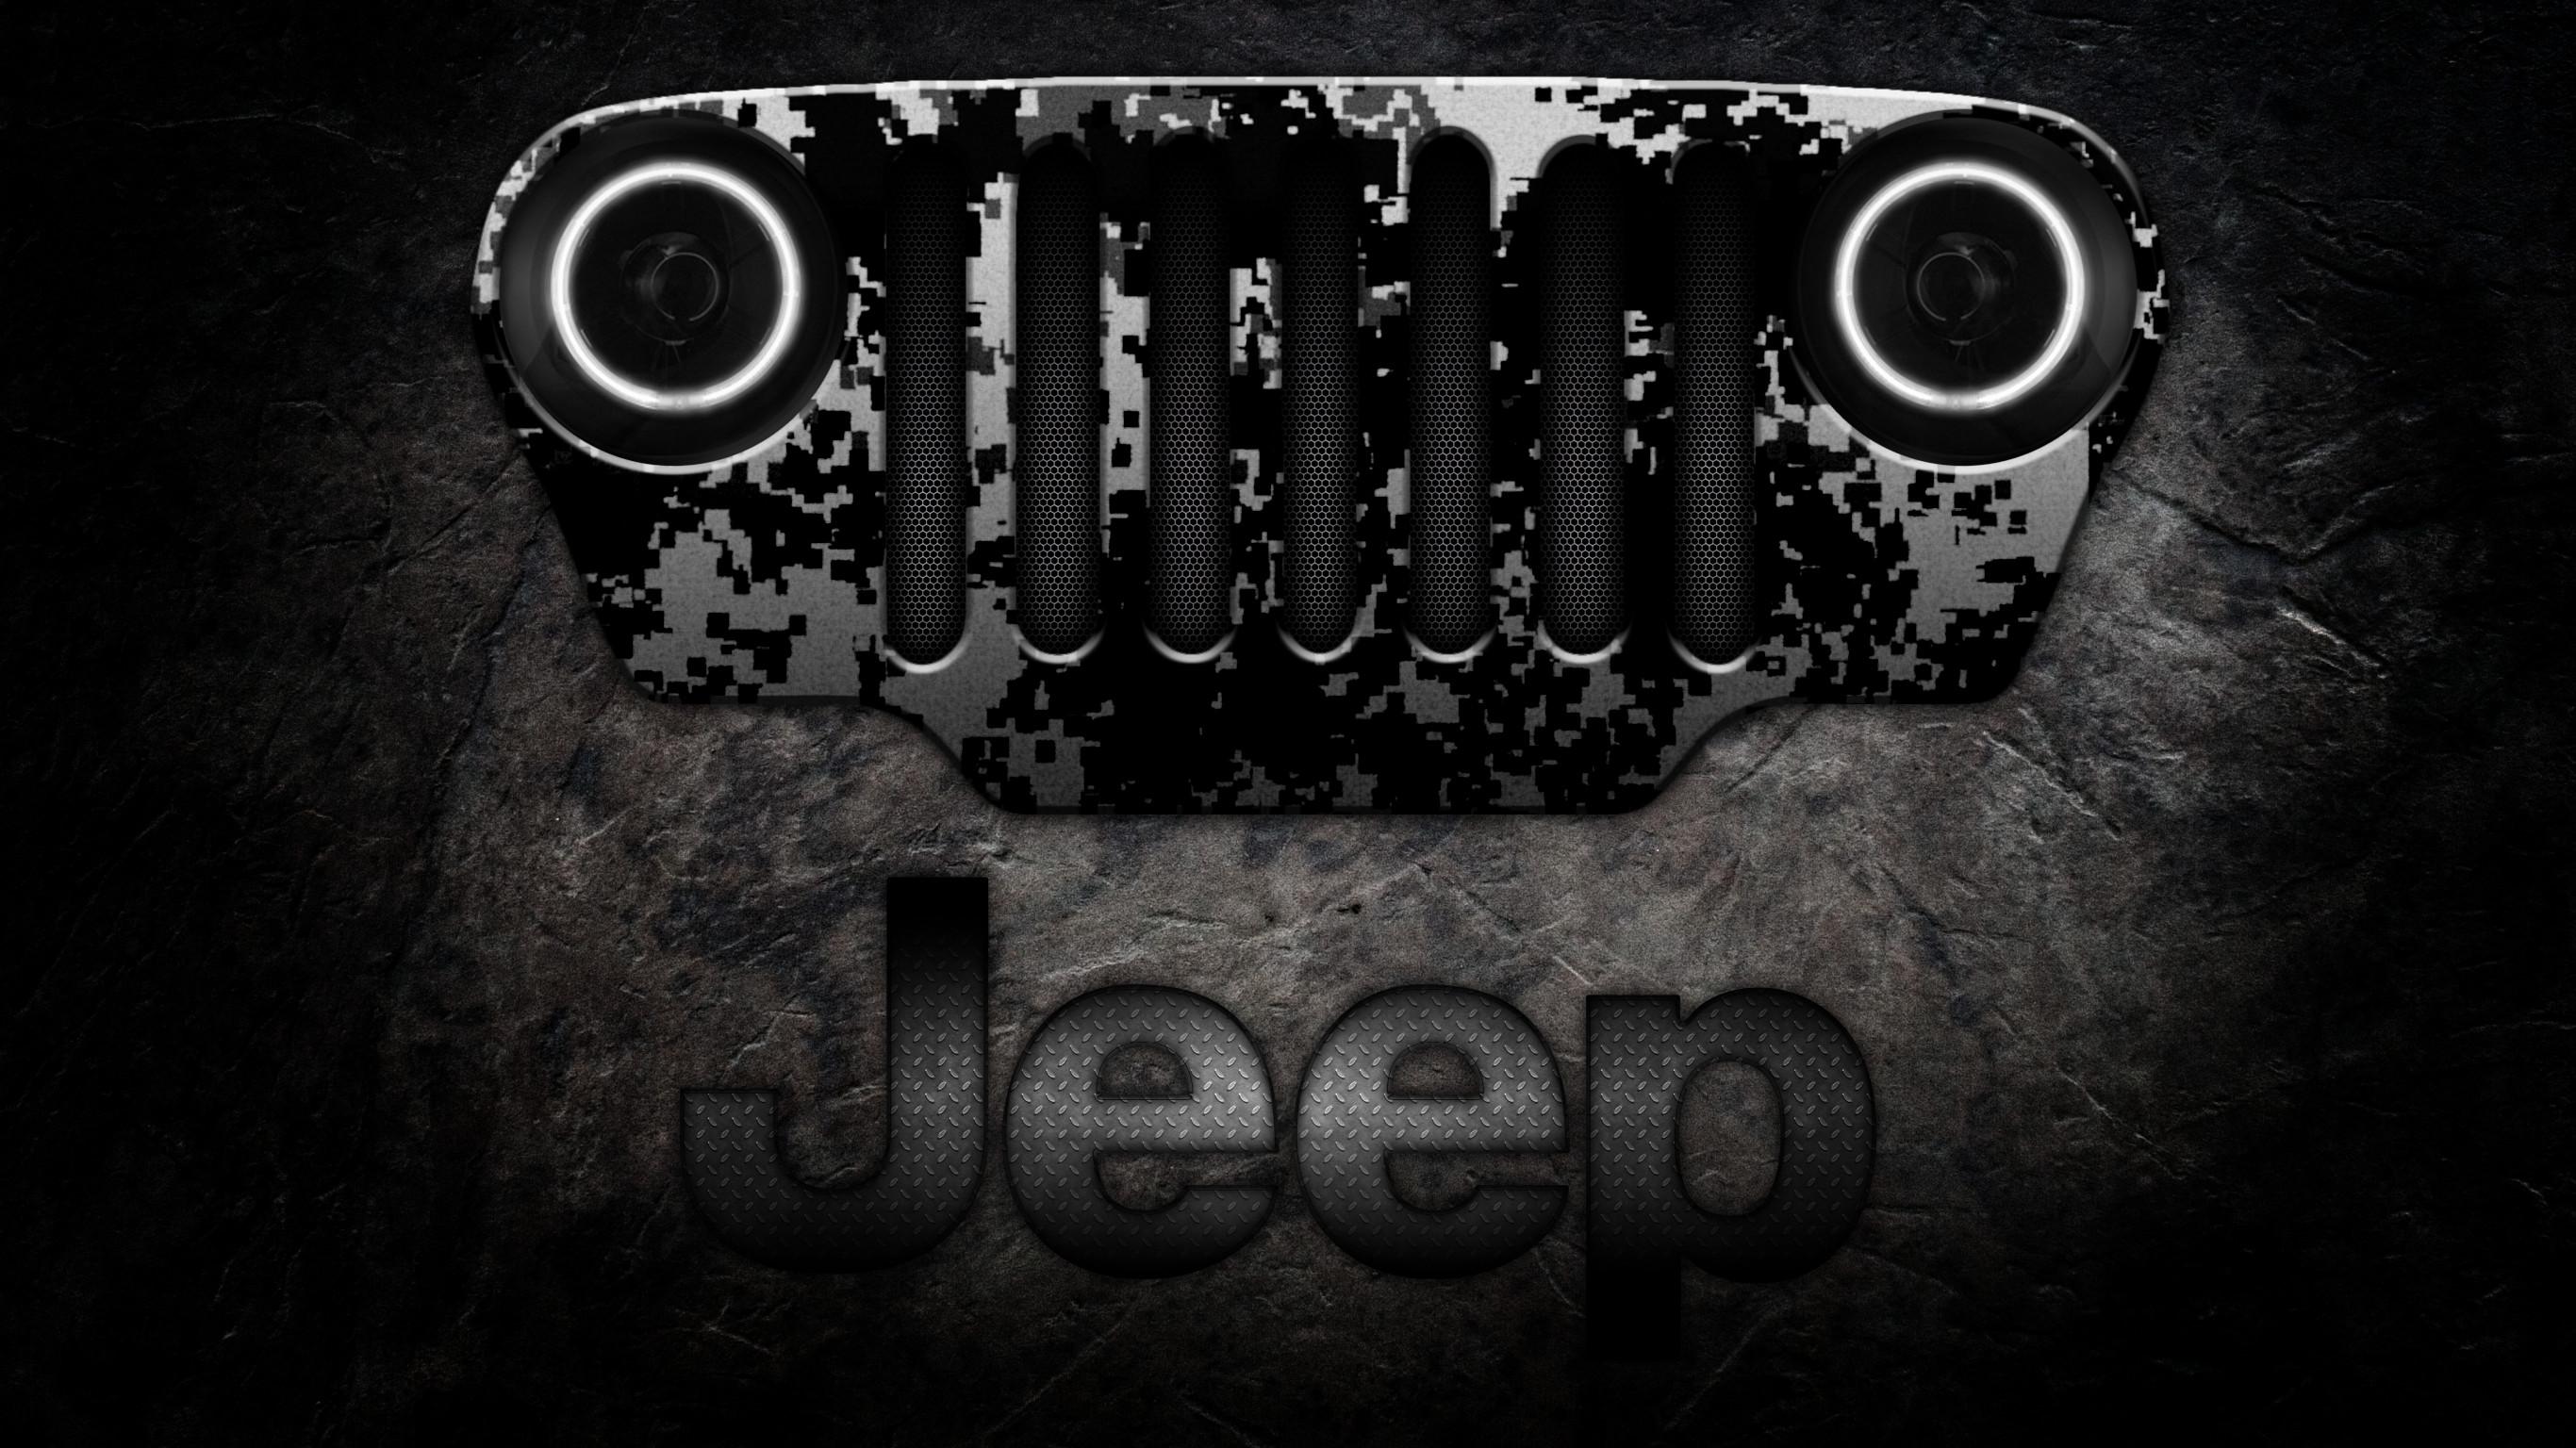 59 Jeep Wrangler Wallpaper Hd